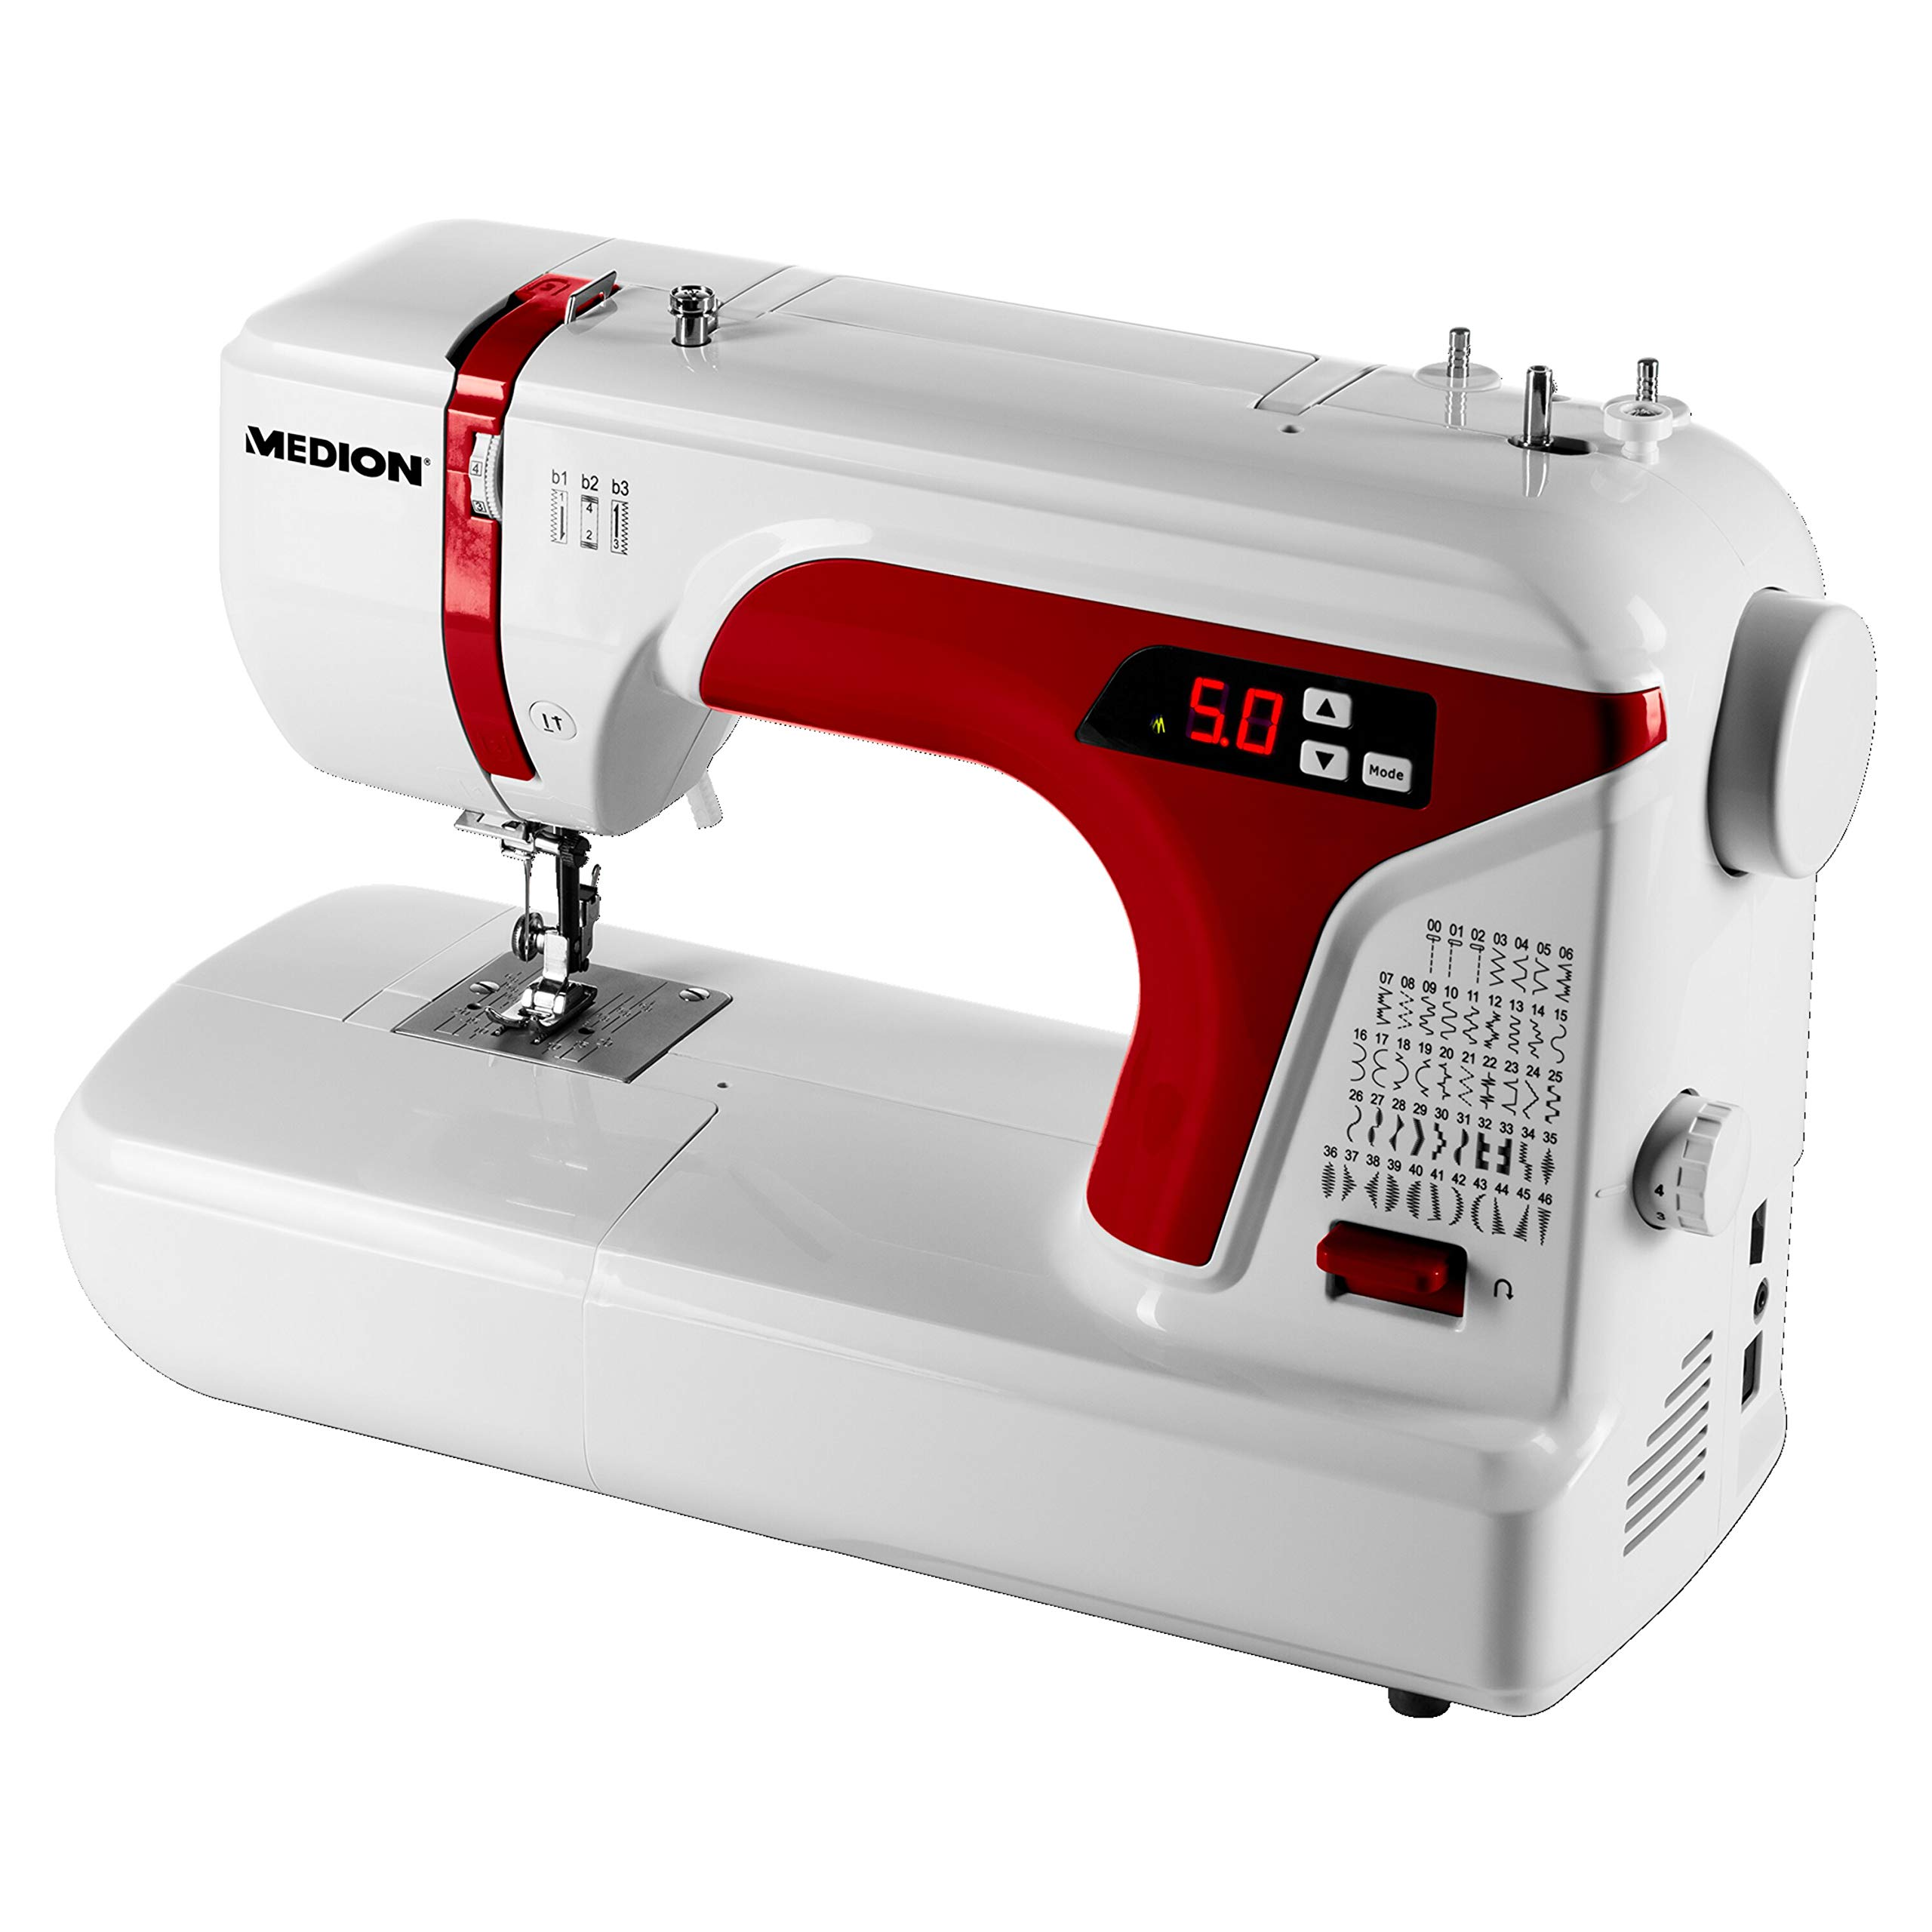 MEDION MD 16661 - Máquina de coser digital, ojal automático, 40 vatios, pantalla LED, 50 patrones de puntada ...